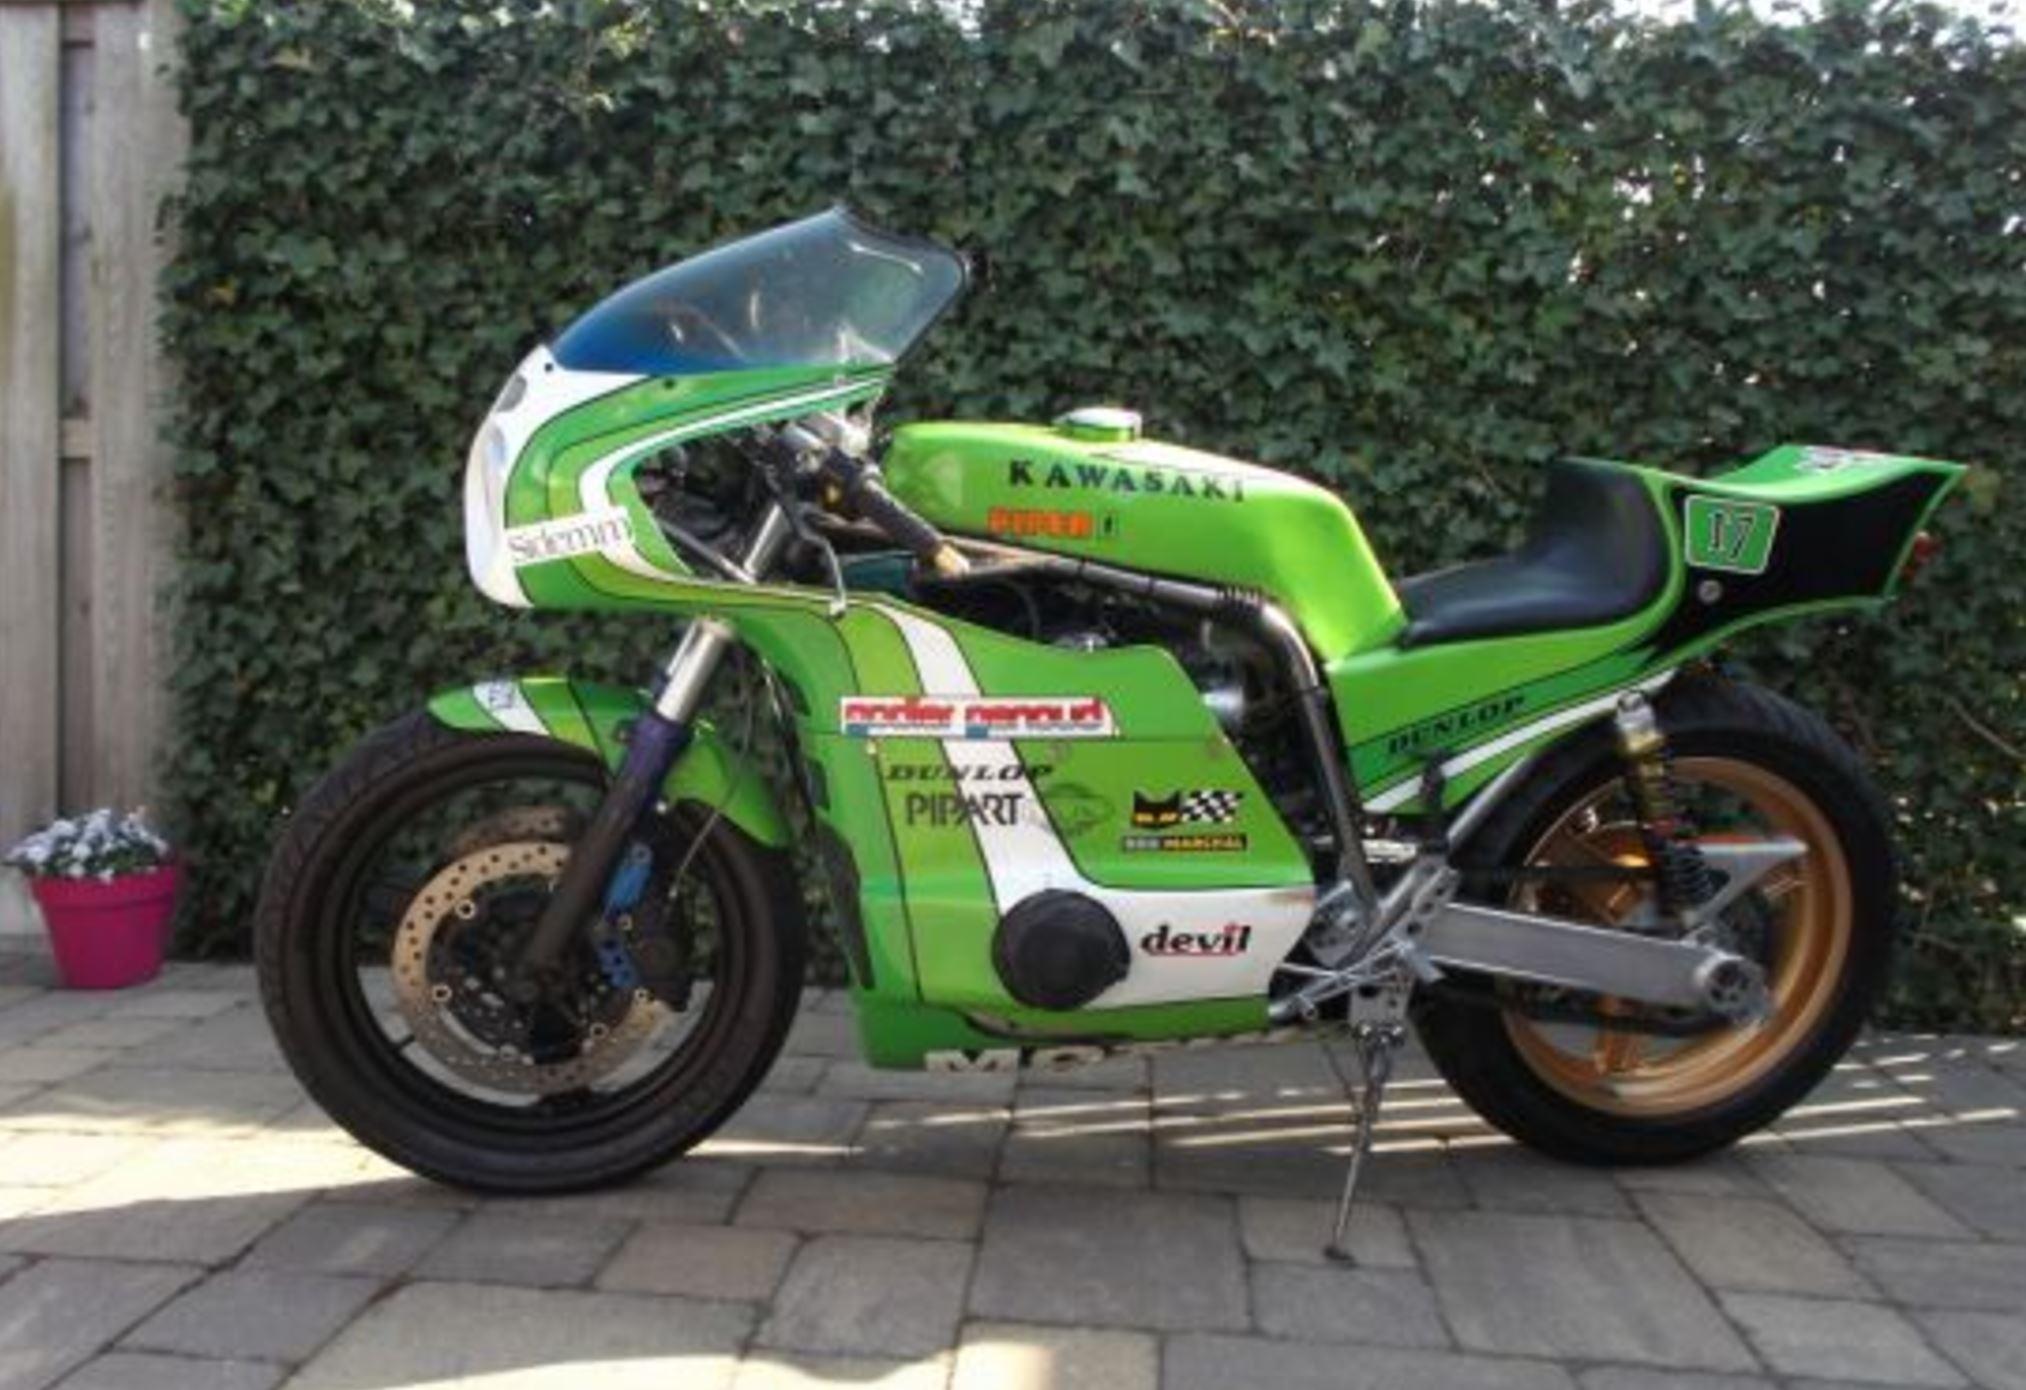 British-Piper-Kawasaki-Endurance-Racer-L